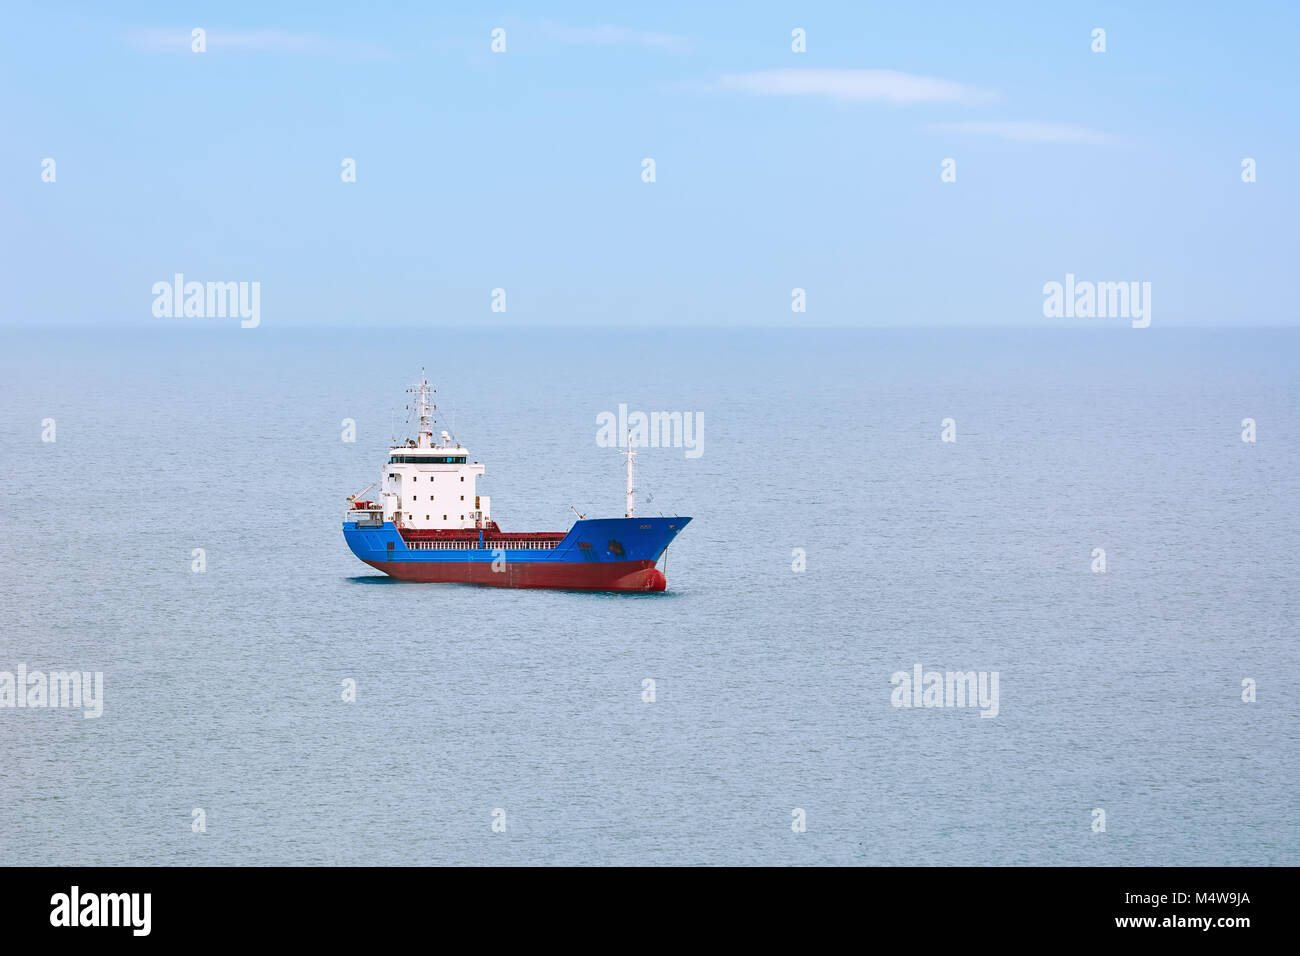 General Cargo Ship - Stock Image